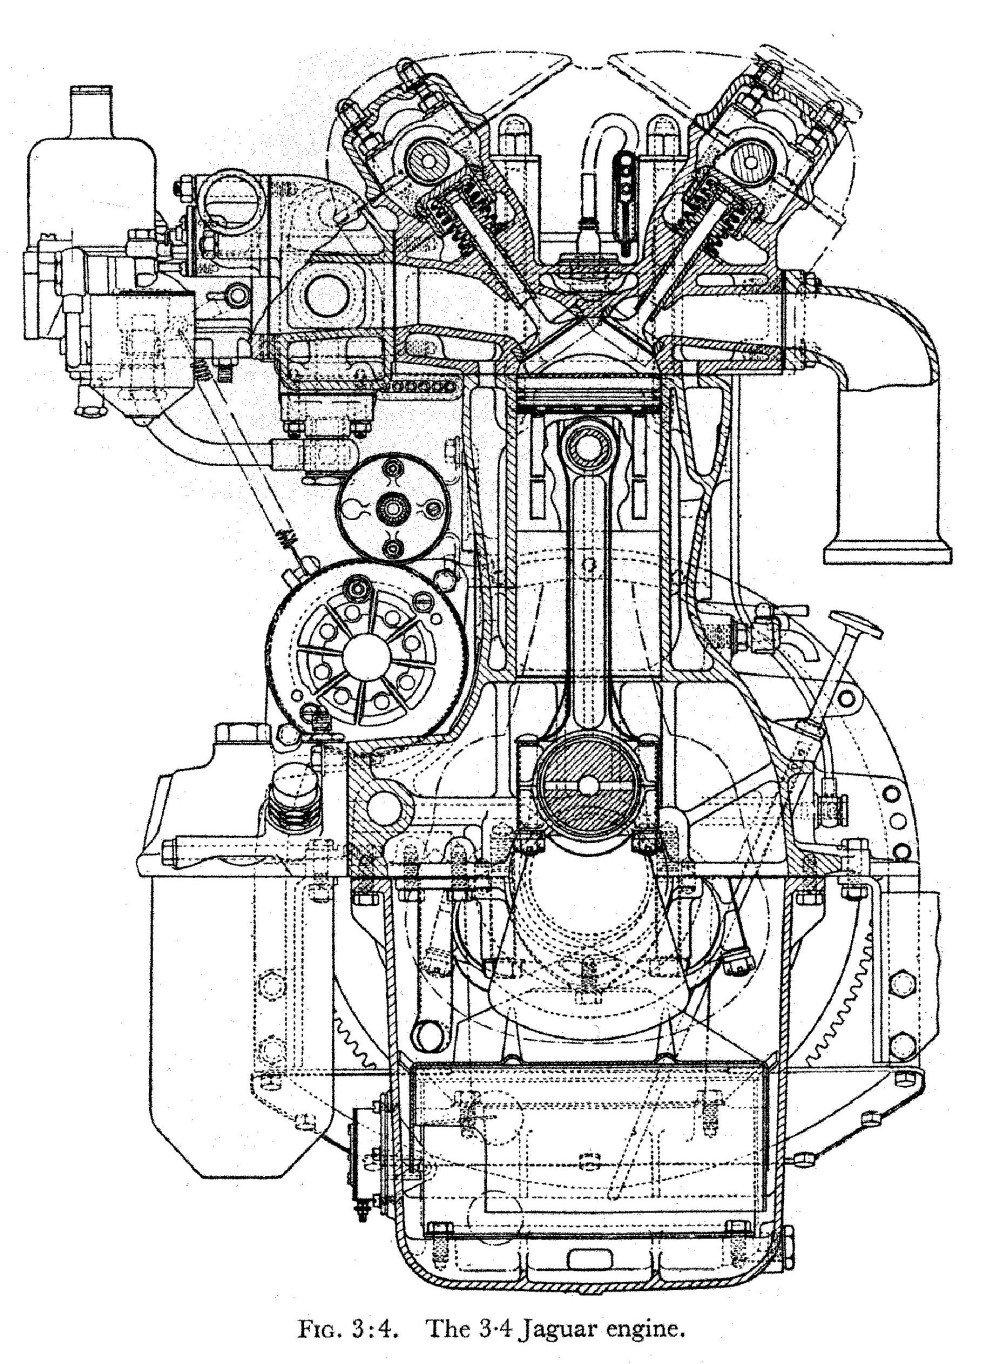 hight resolution of image 9 of 24 1949 jaguar xk straight six